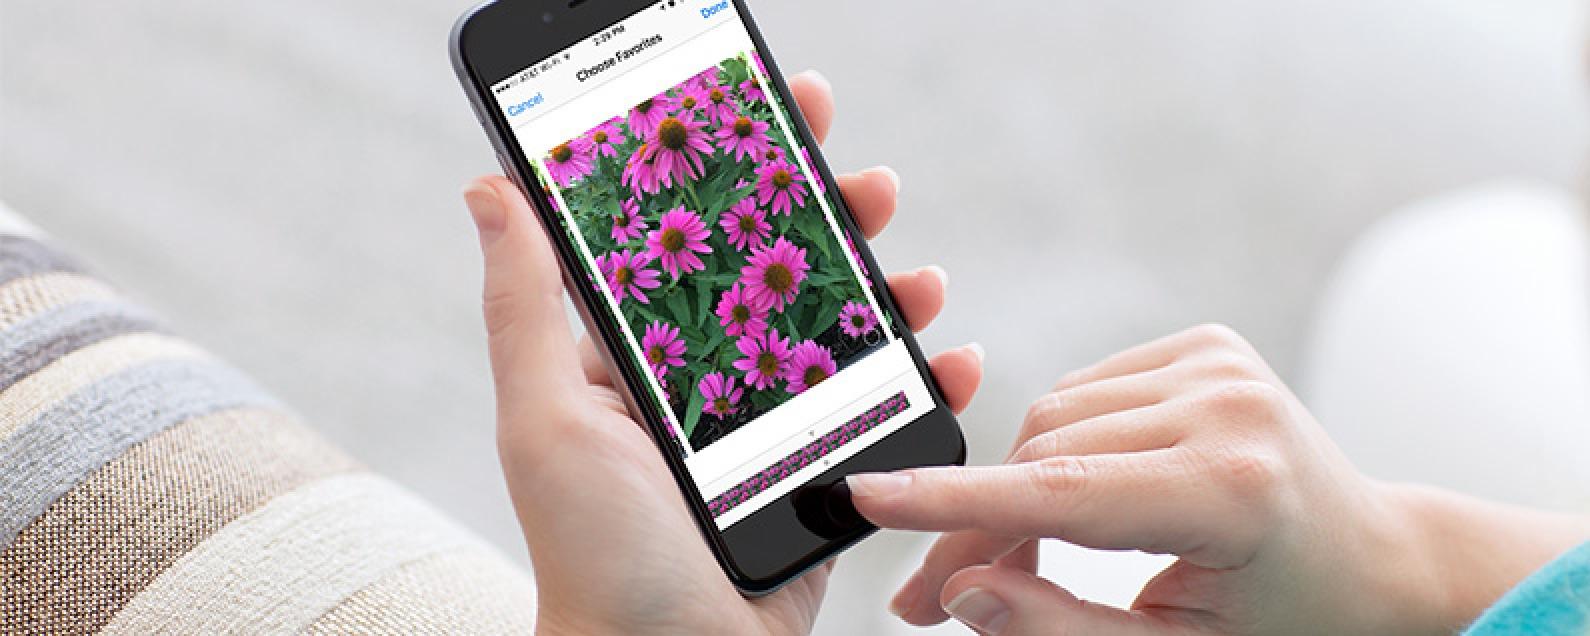 iPhone Burst Mode: How to Take, View, & Save Burst Photos on